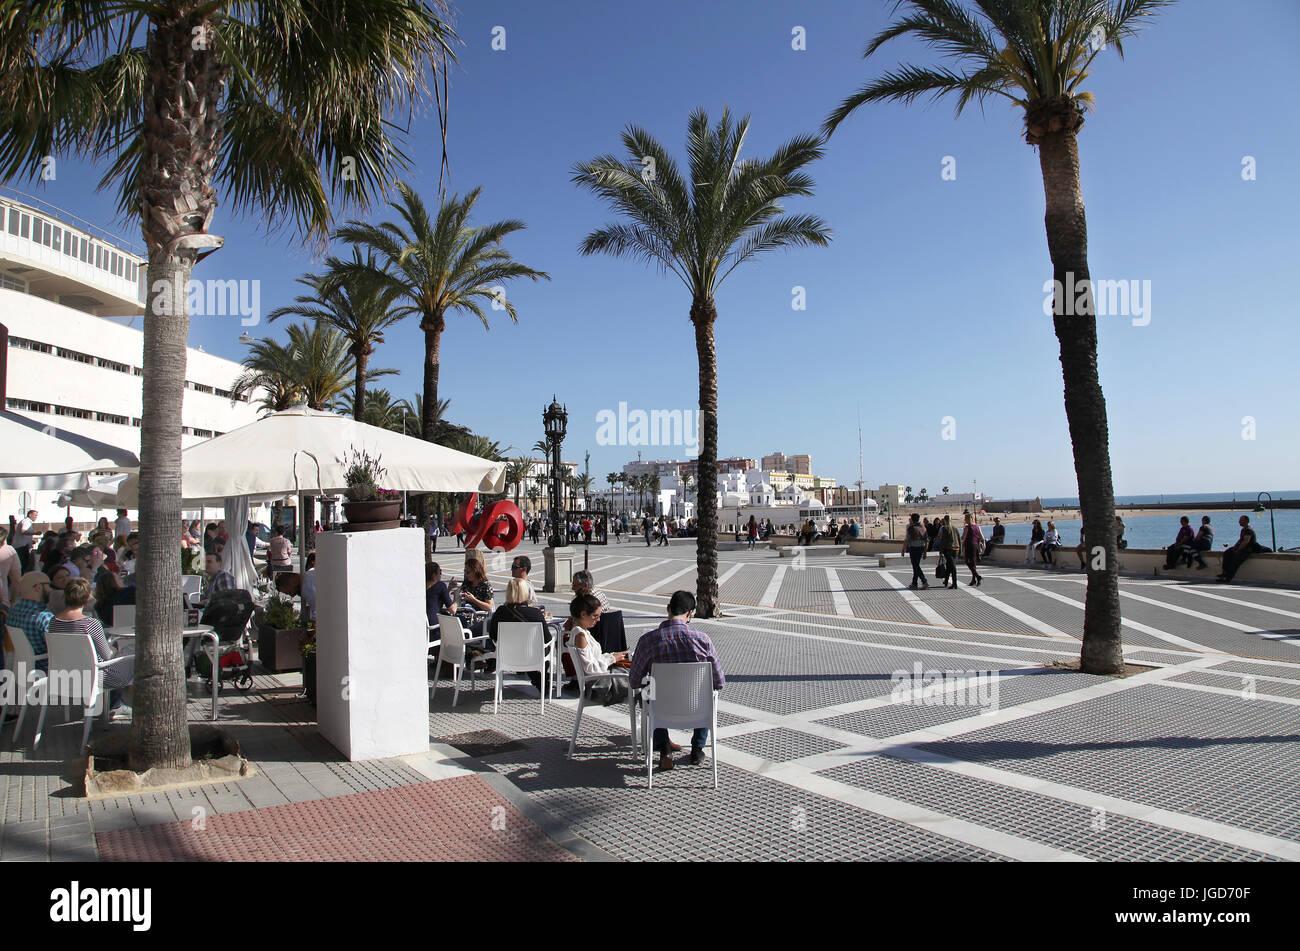 Cadice boulevard e cafè sul marciapiede.Andalusia Spagna. Foto Stock